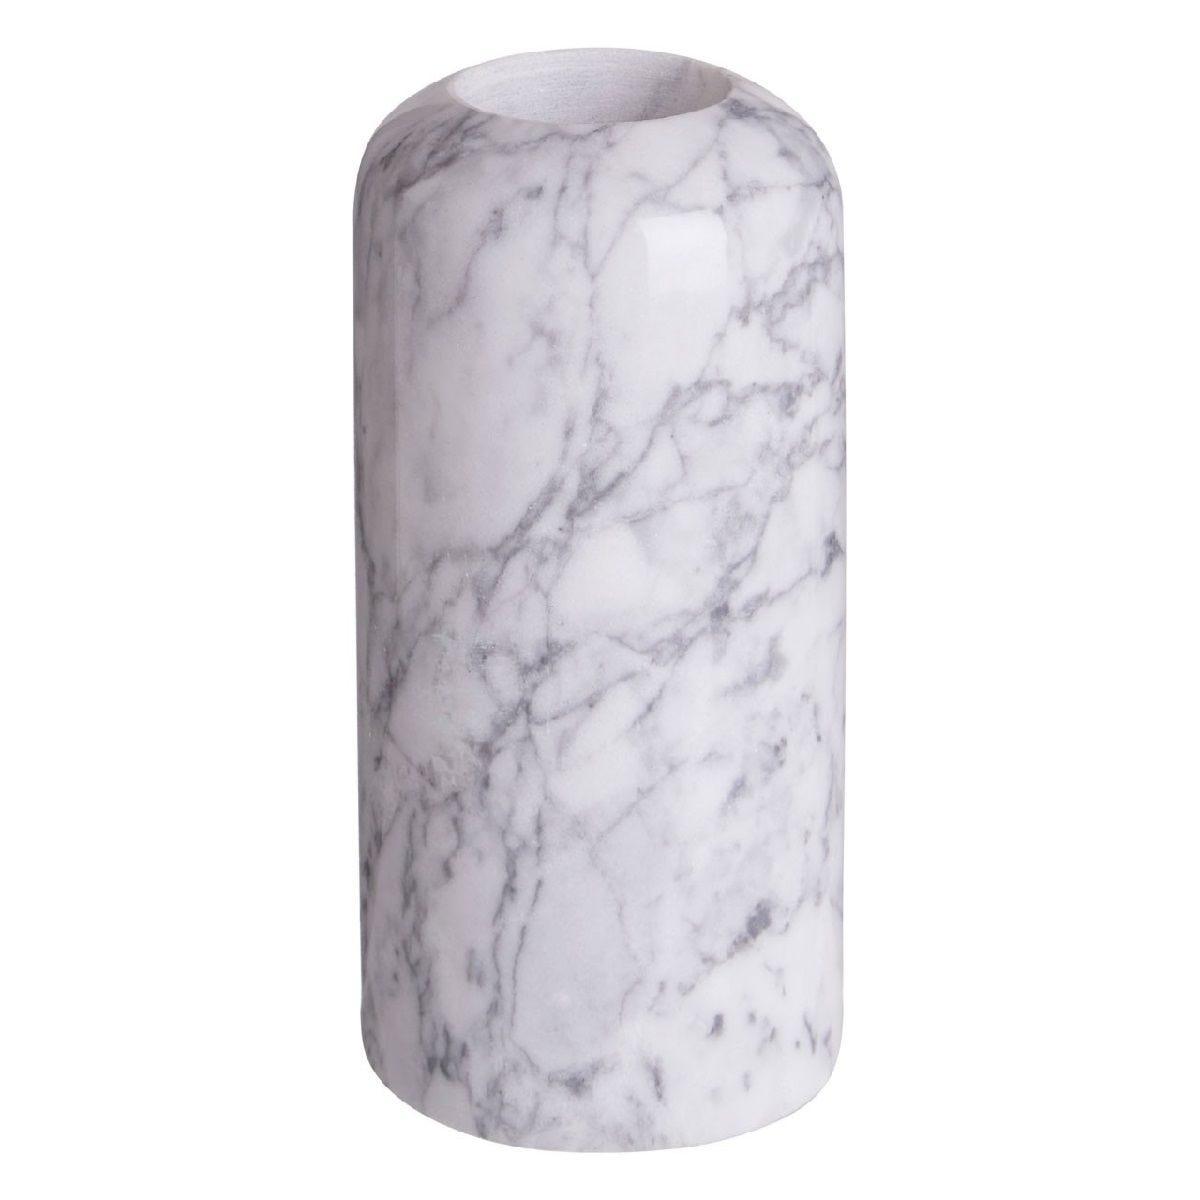 Premier Housewares Lamonte Candle Holder Large Tealight - Grey Marble